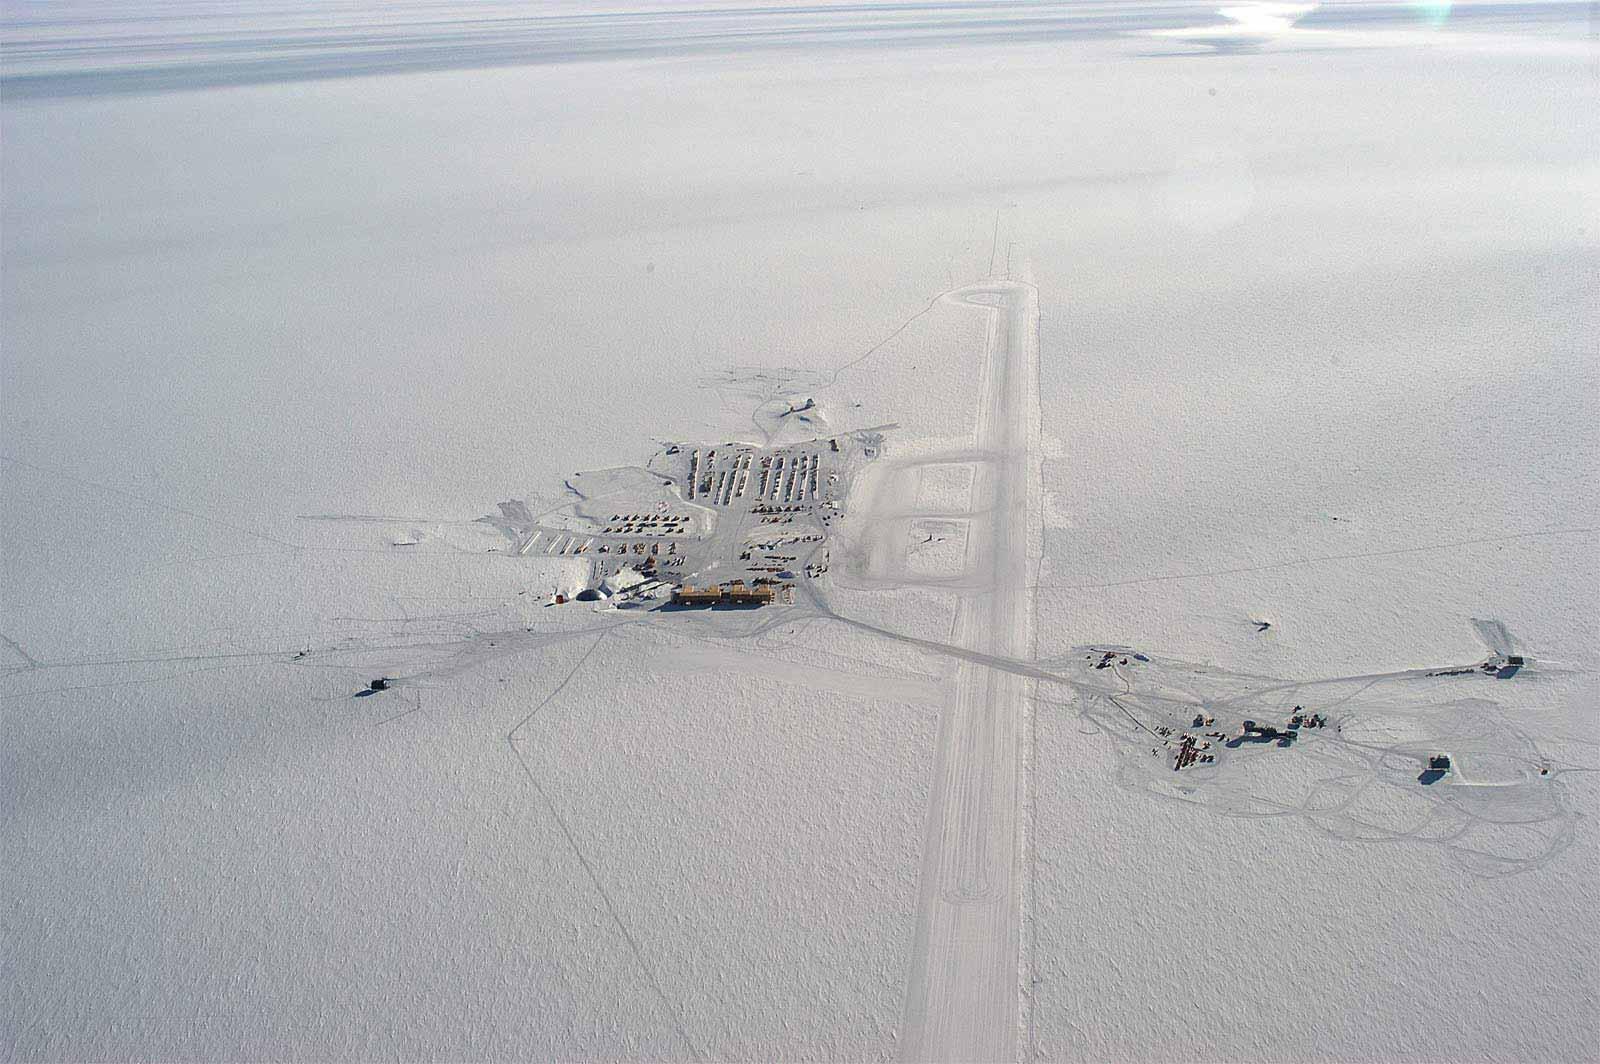 Antarktis Verbotene Zone